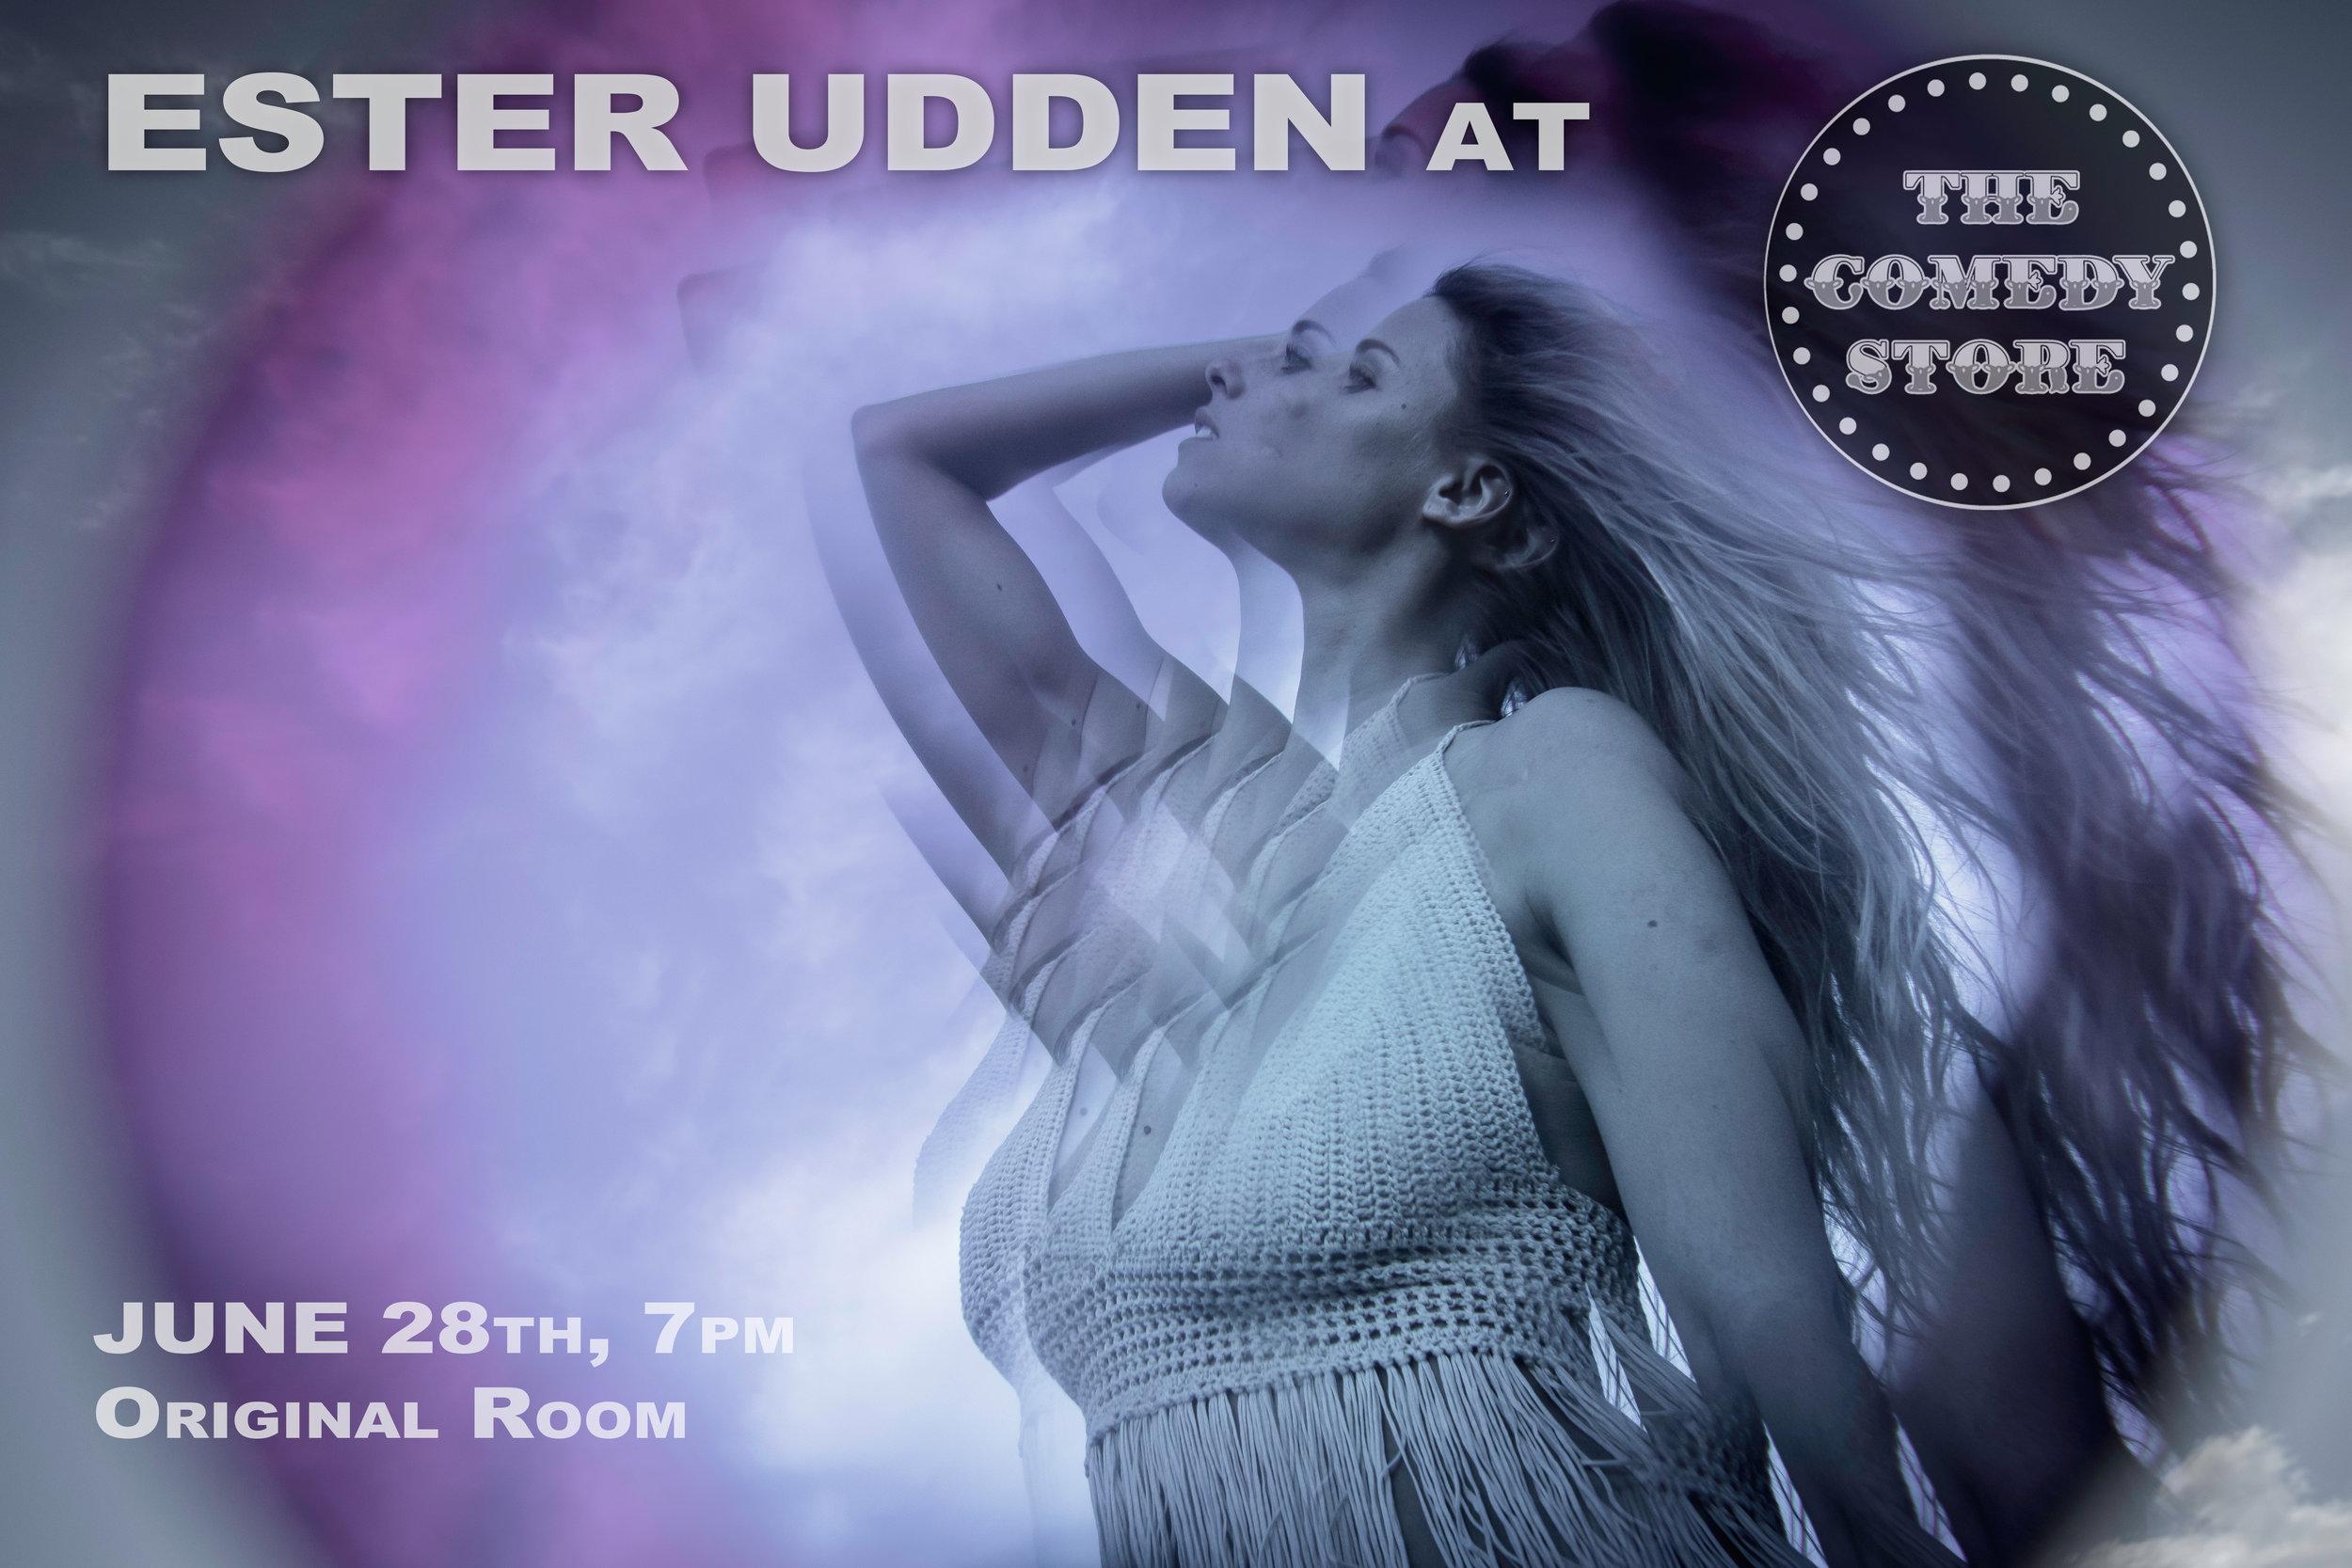 Ester Udden @ The Comedy Store, June 28th